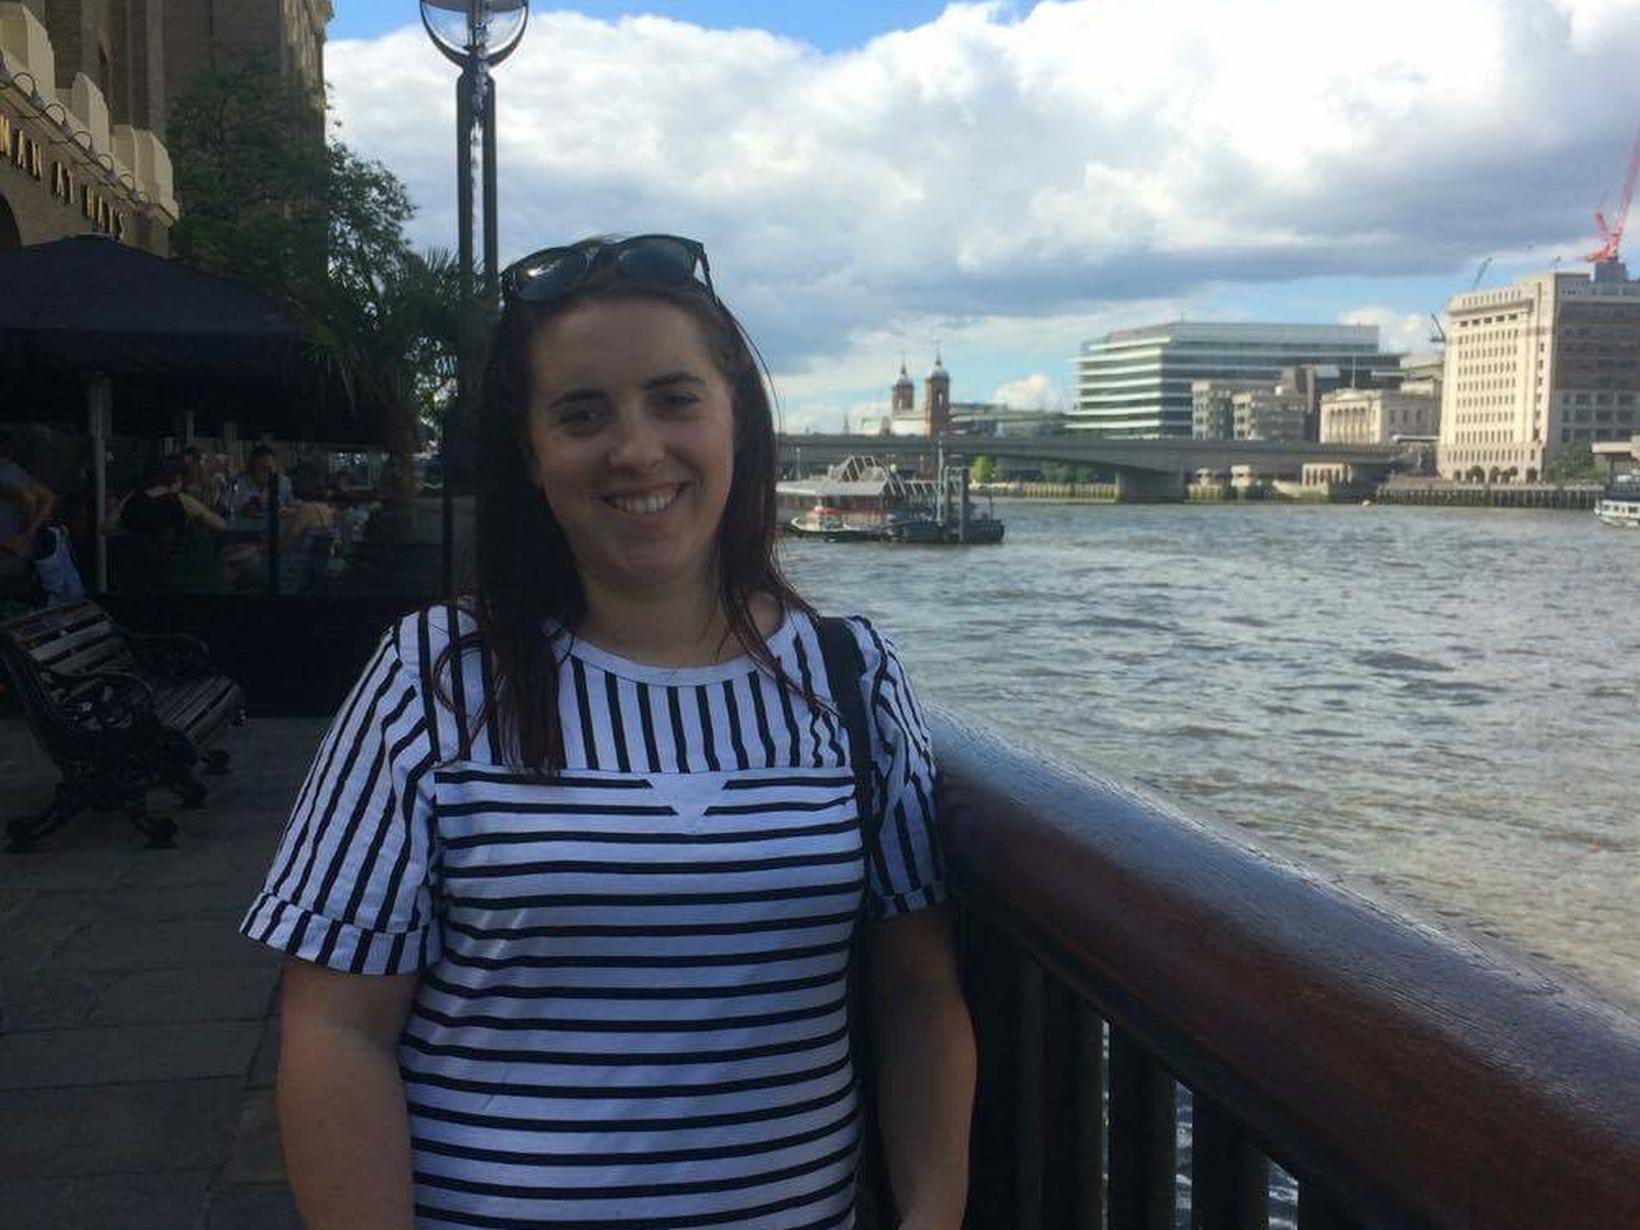 Sarah from London, United Kingdom